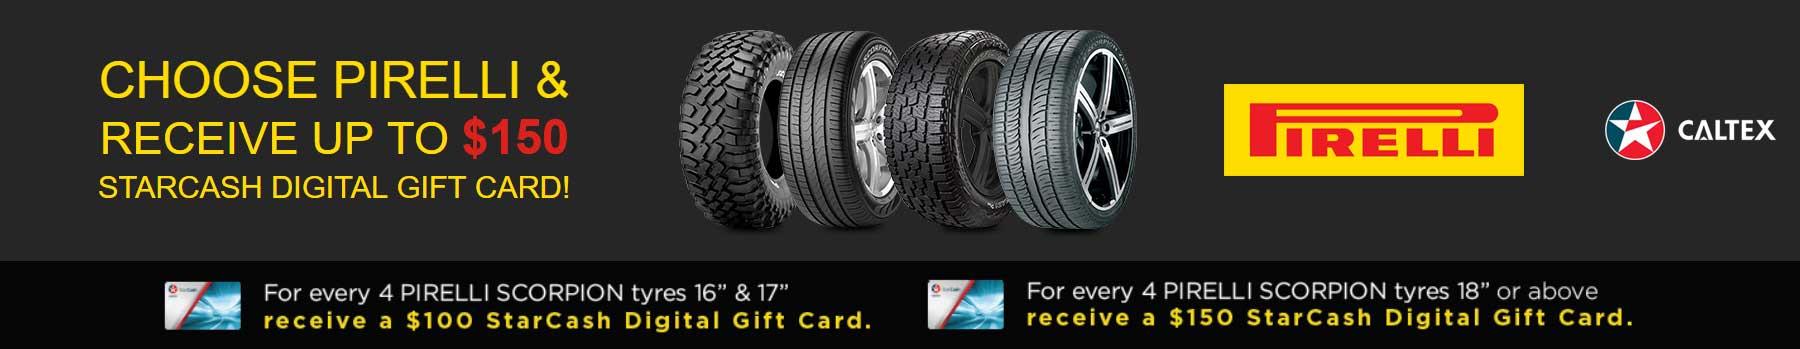 Pirelli Starcash Gift Card